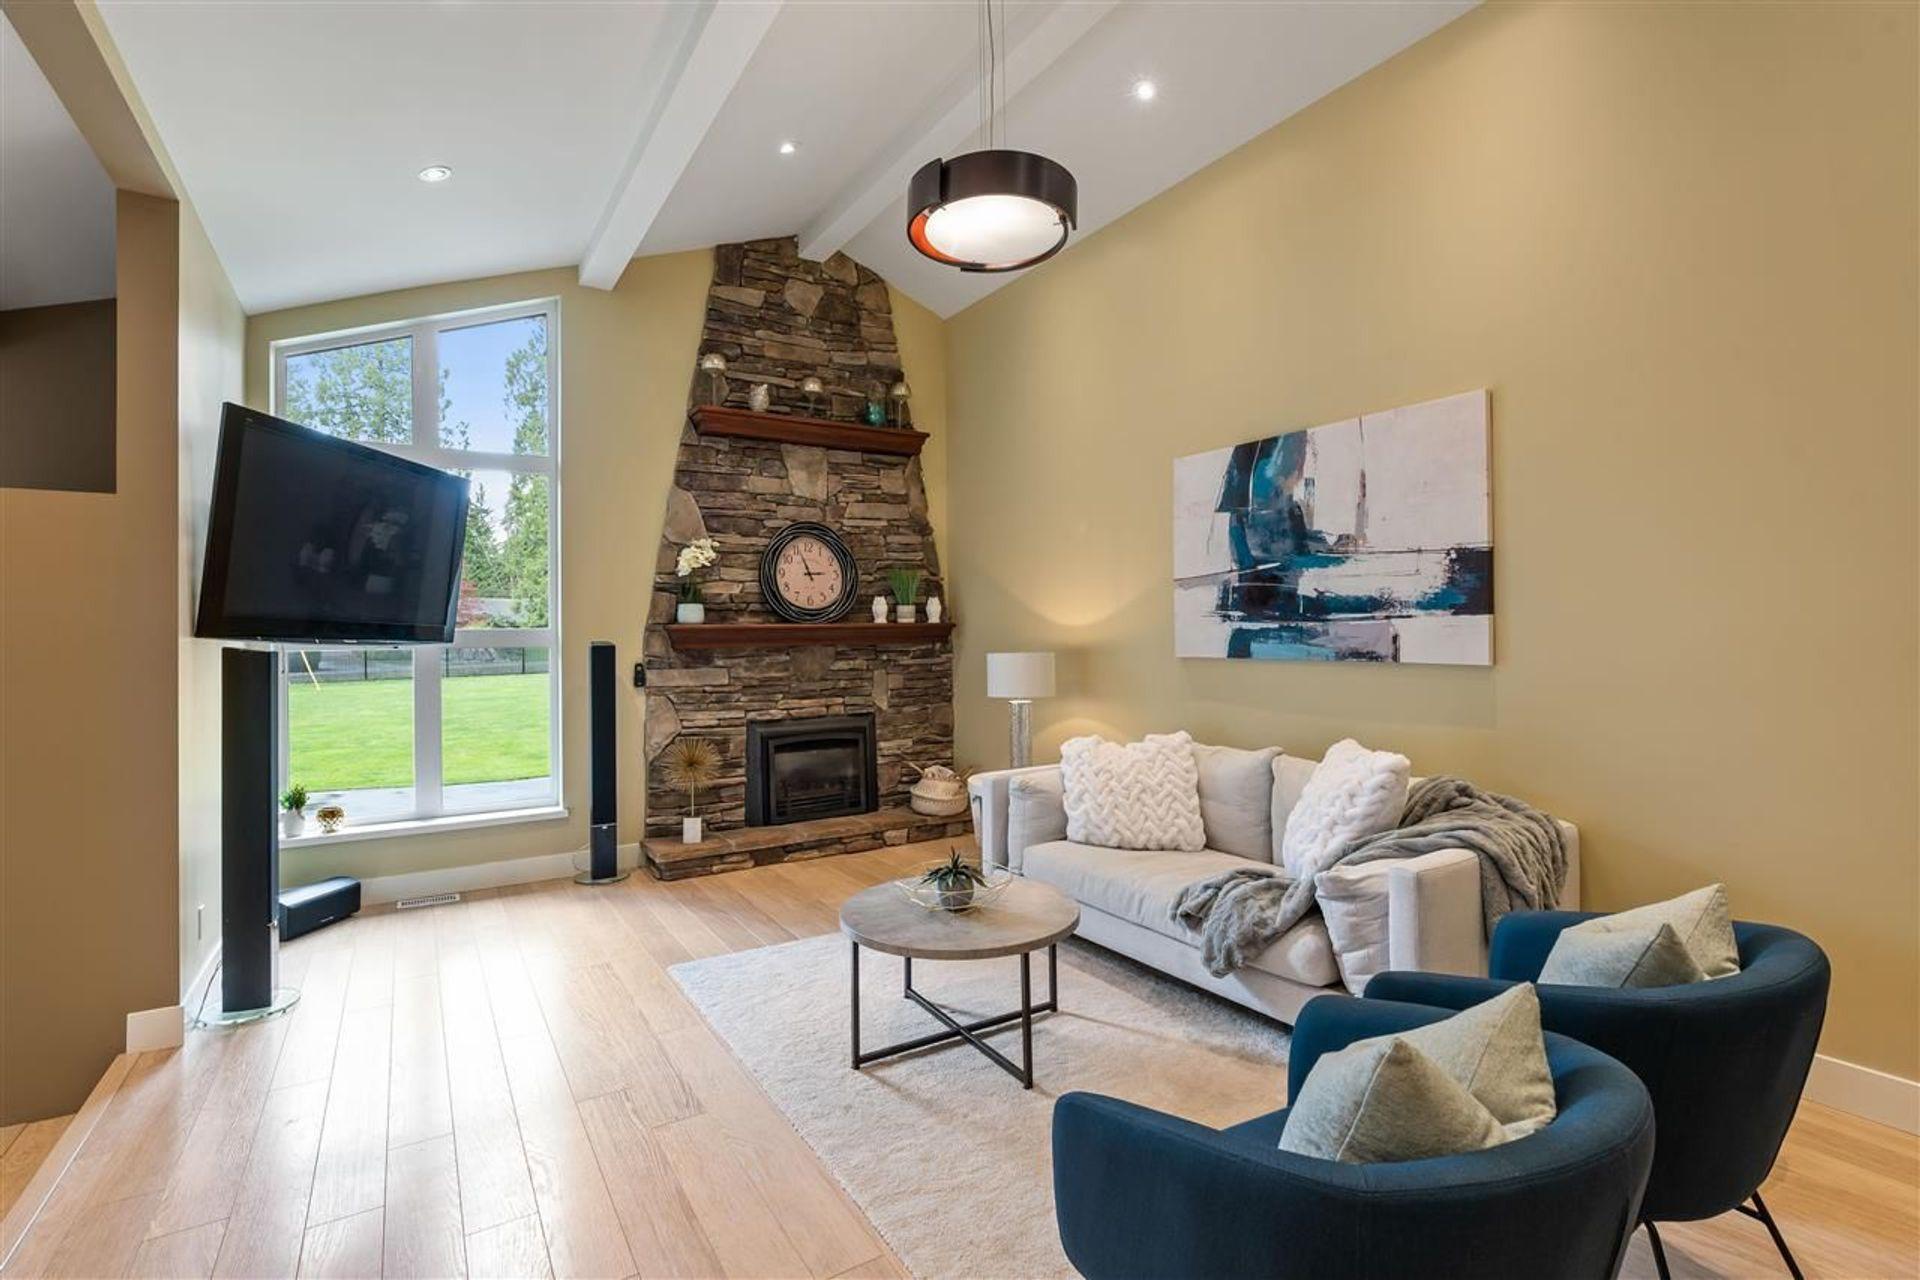 24852-ferguson-avenue-cottonwood-mr-maple-ridge-09 of 24852 Ferguson Avenue, Cottonwood MR, Maple Ridge